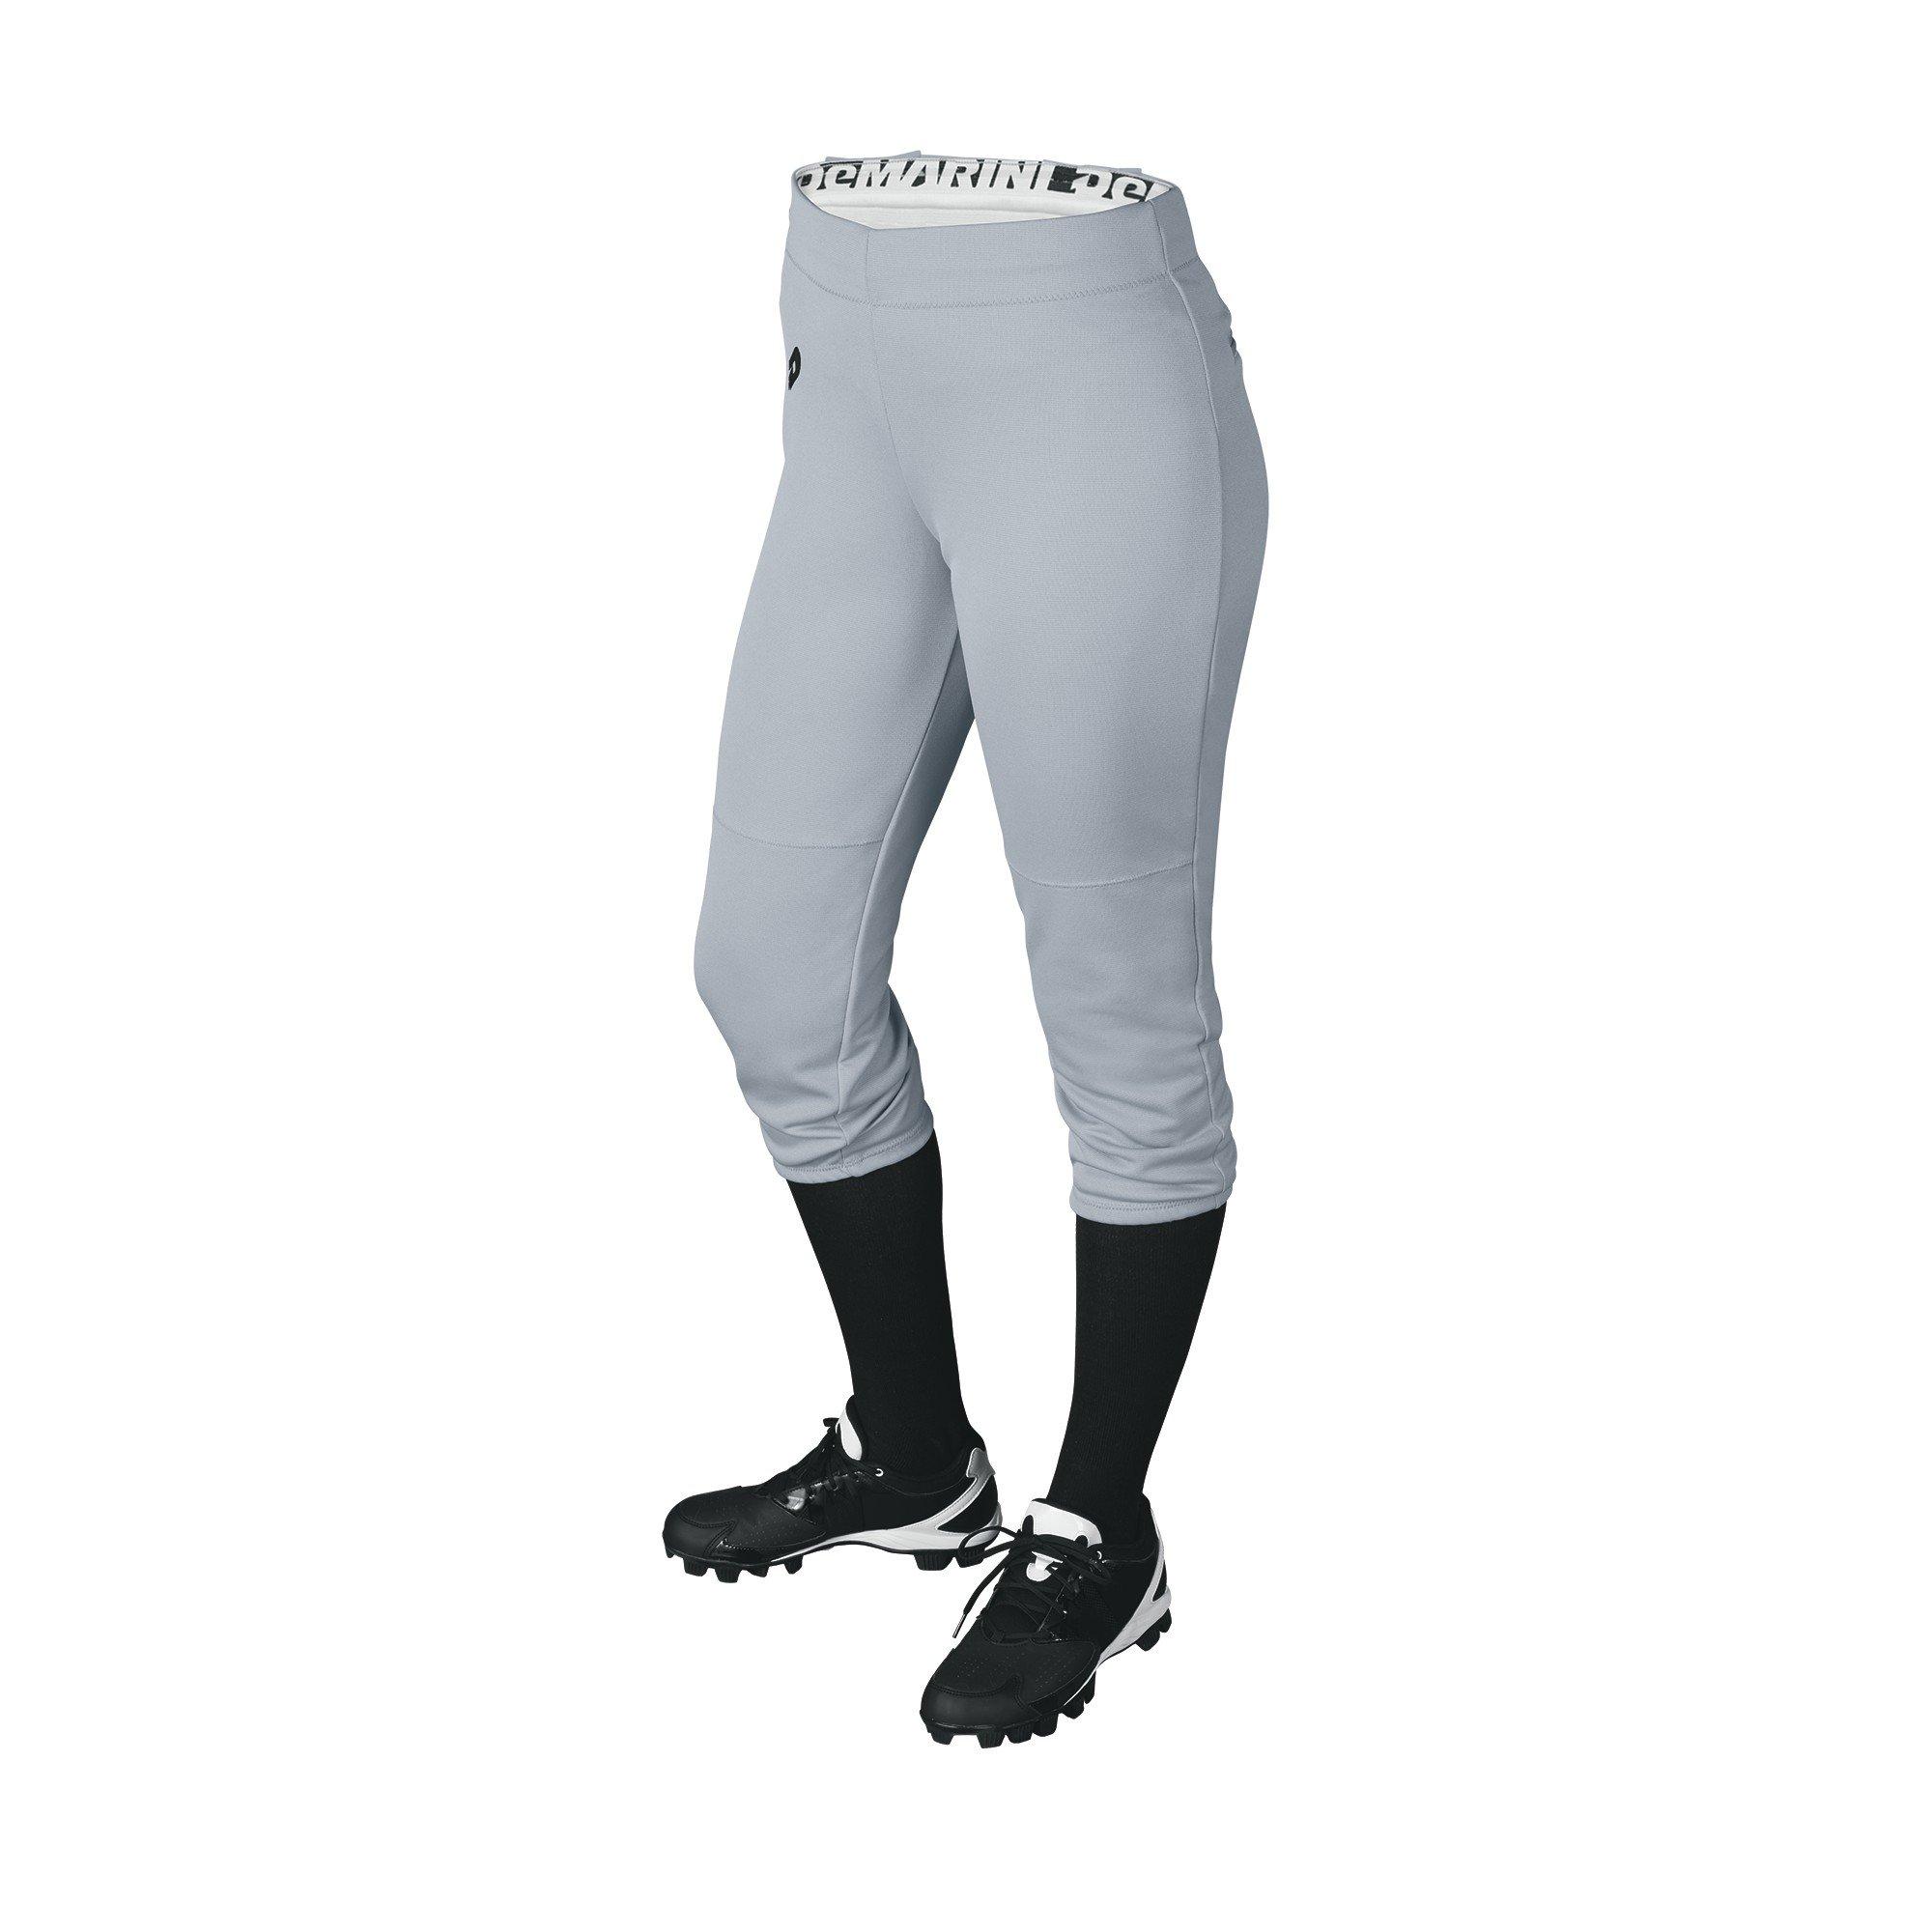 DeMarini Womens Sleek Pull Up Pant, Blue Grey, Medium by DeMarini (Image #1)